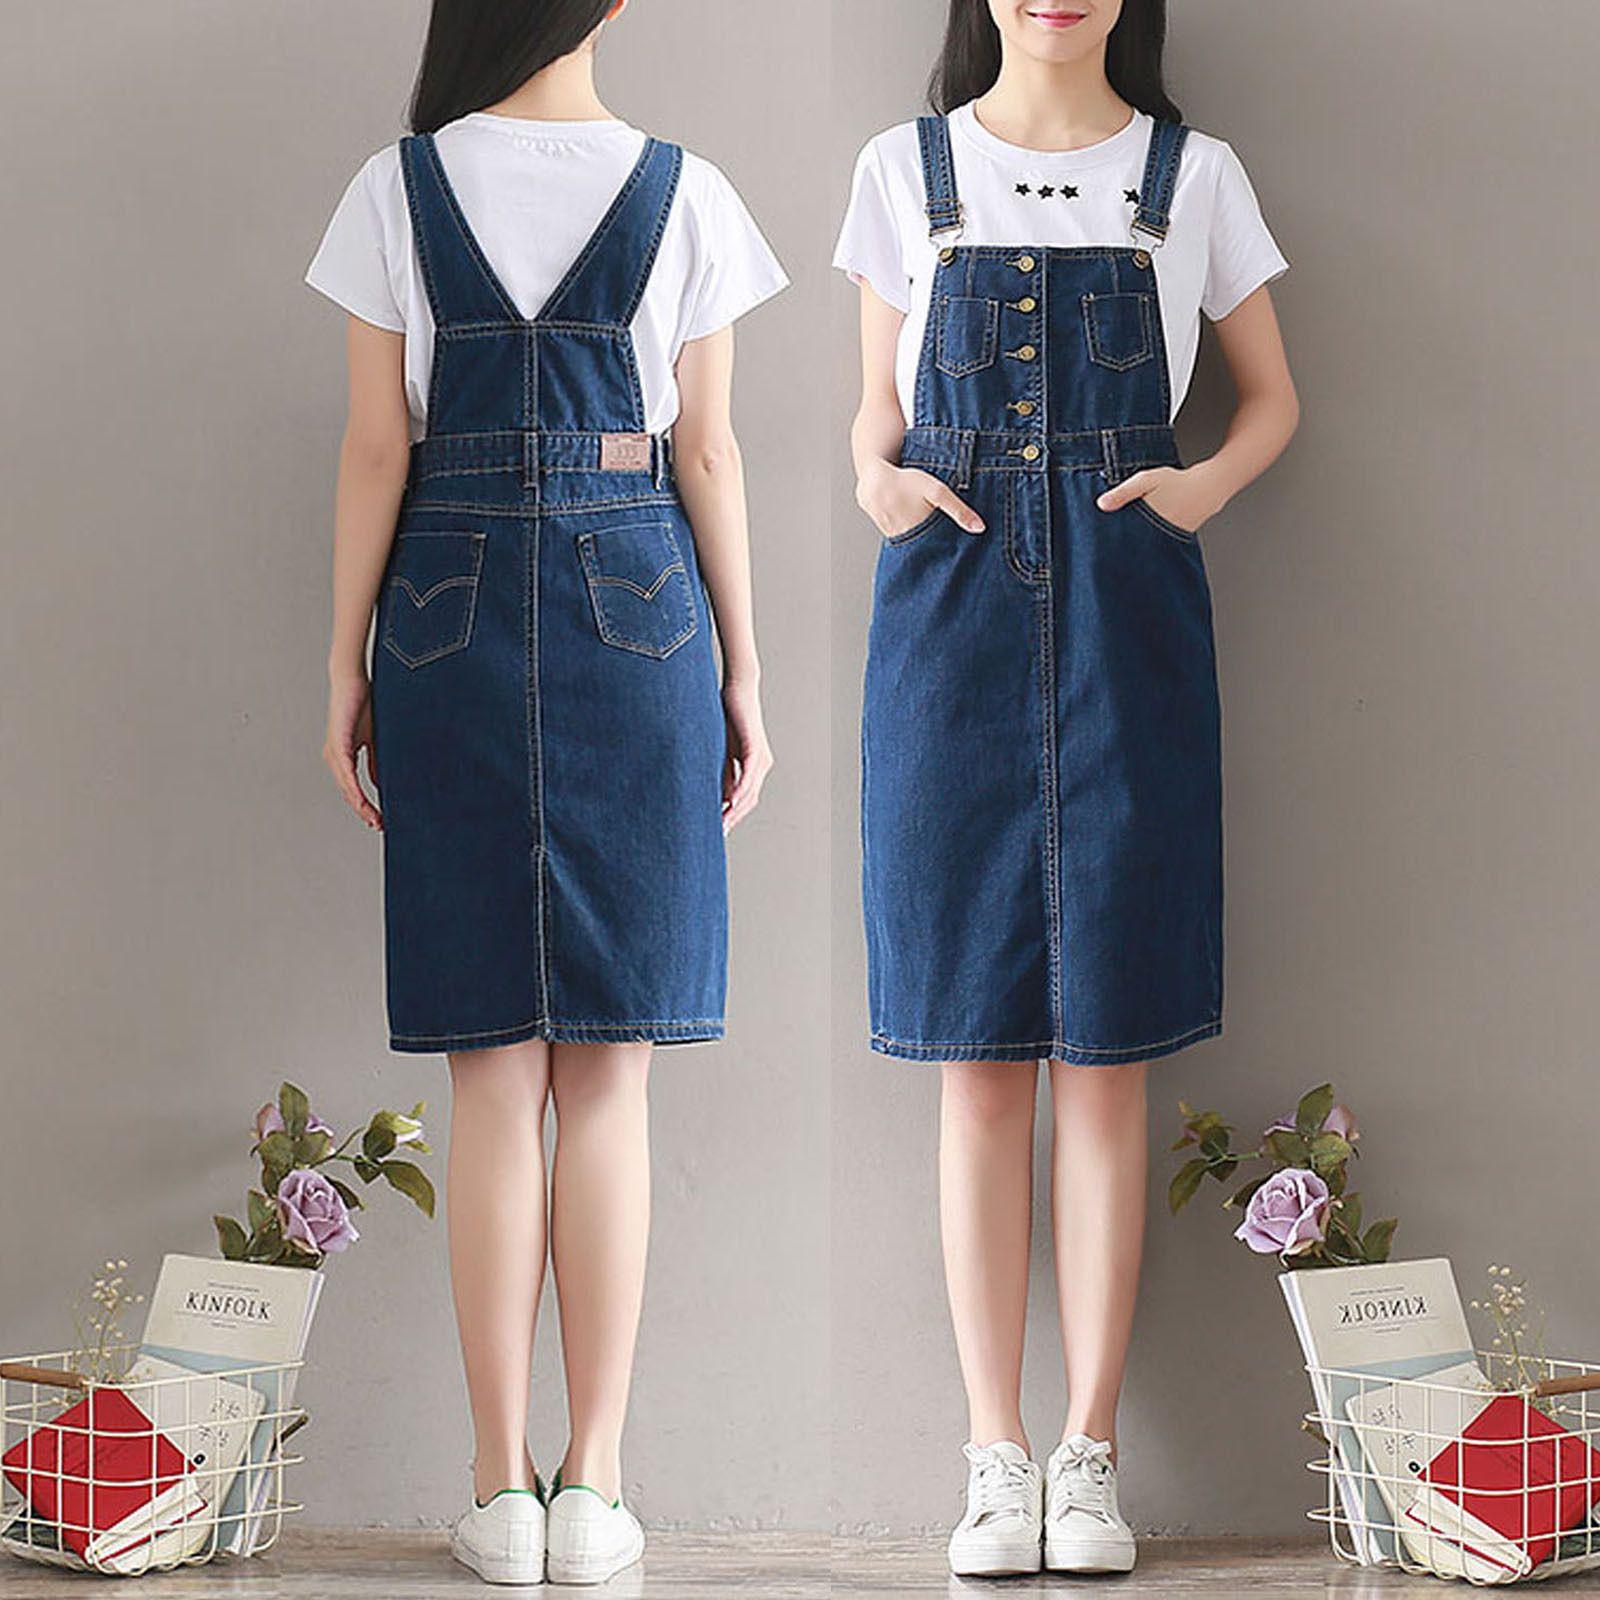 cb5ac17e38 2017 Women Casual Denim Strap Dungaree Knee-Length Dress Jeans Overalls  Skirts